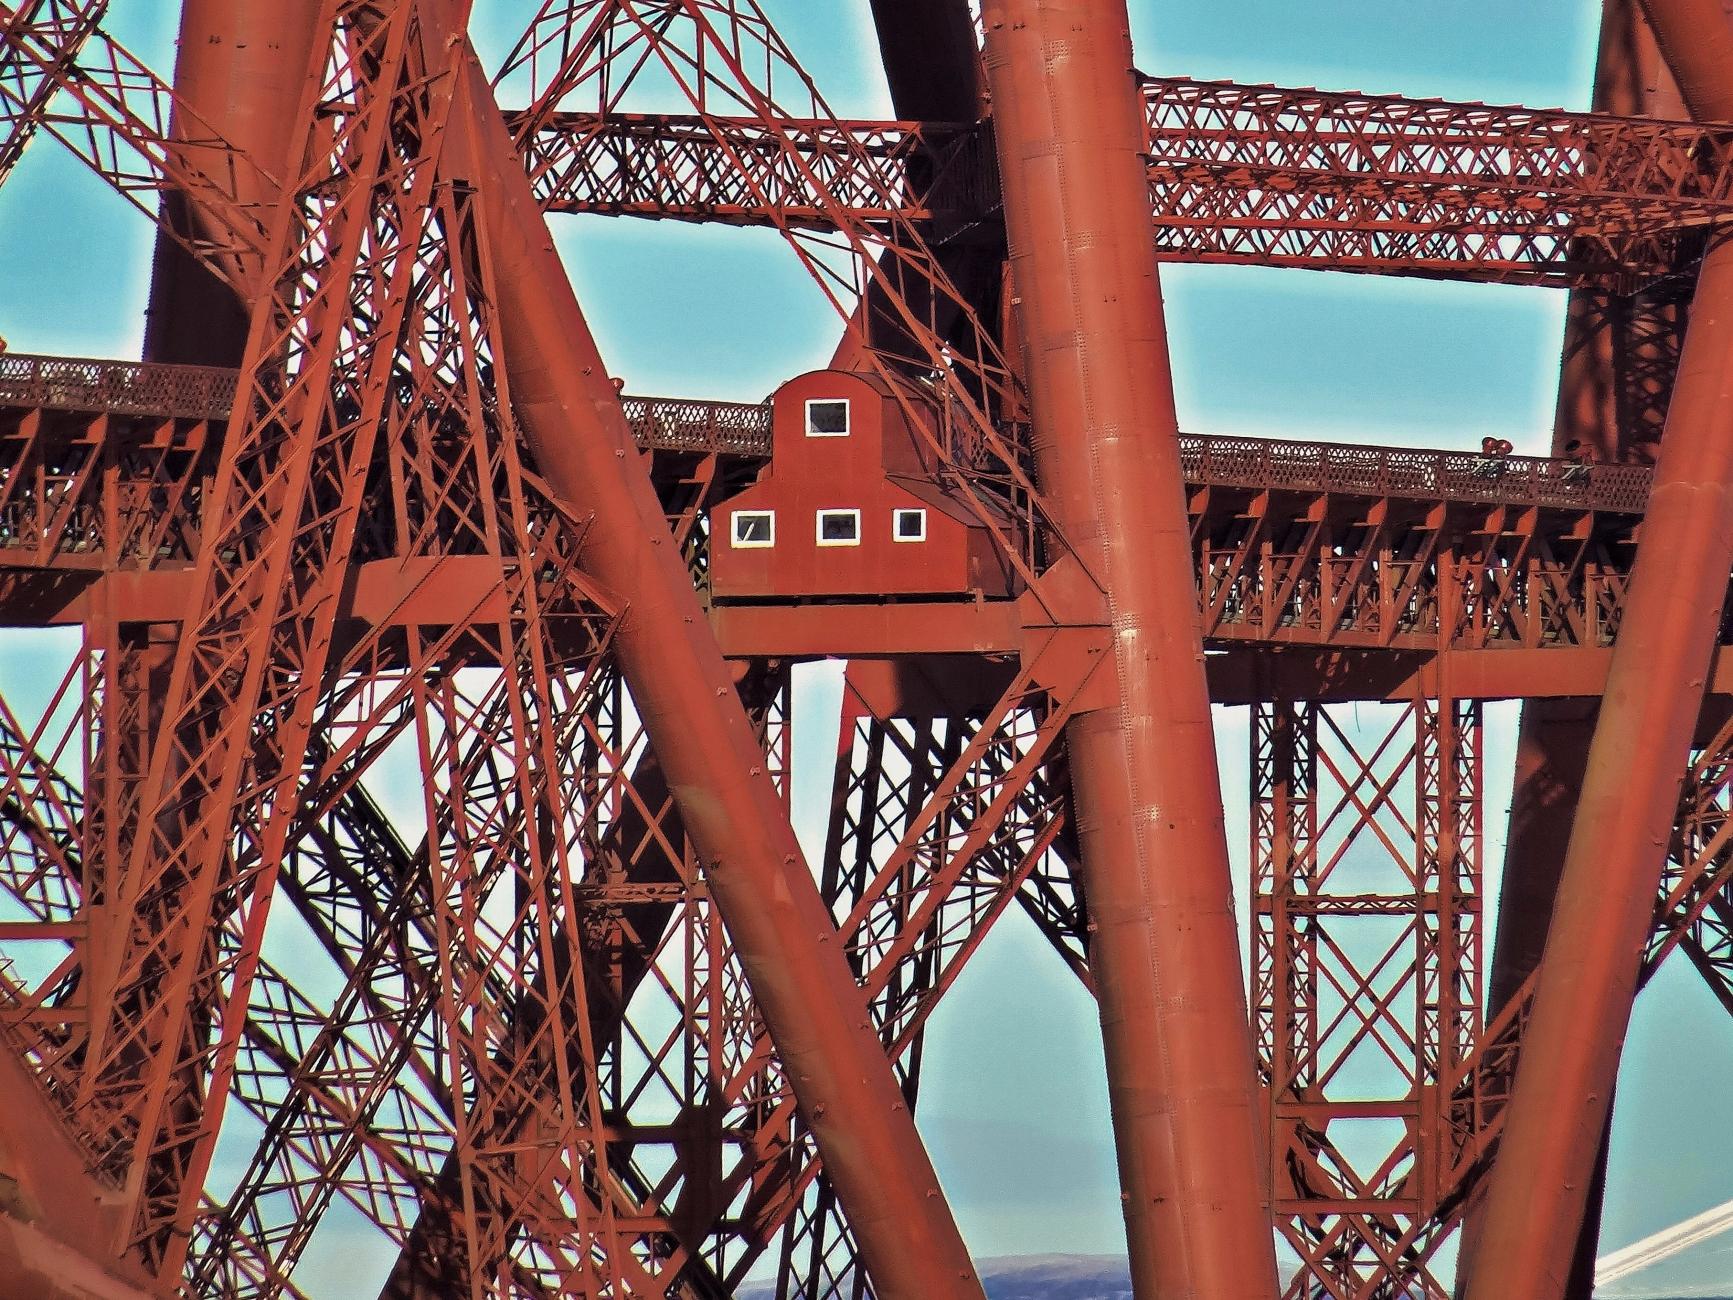 Bridge Painters' Bothy